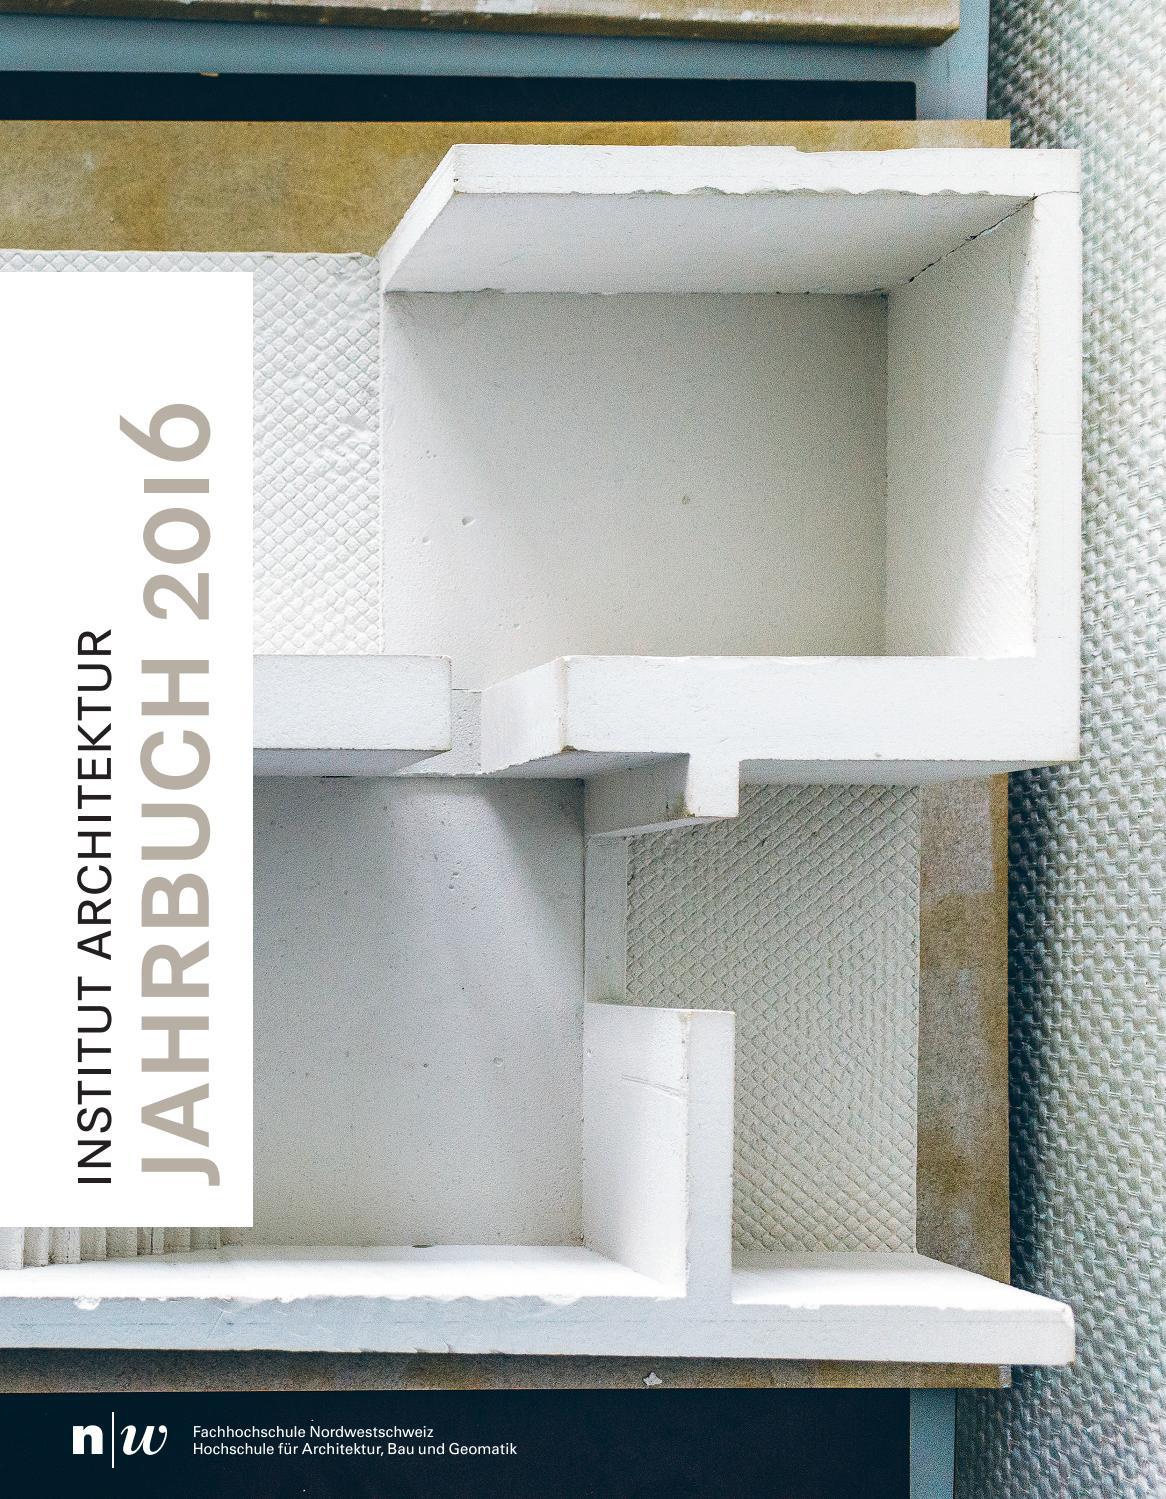 Fhnw iarch jahrbuch 2016 by master architektur issuu for Master architektur